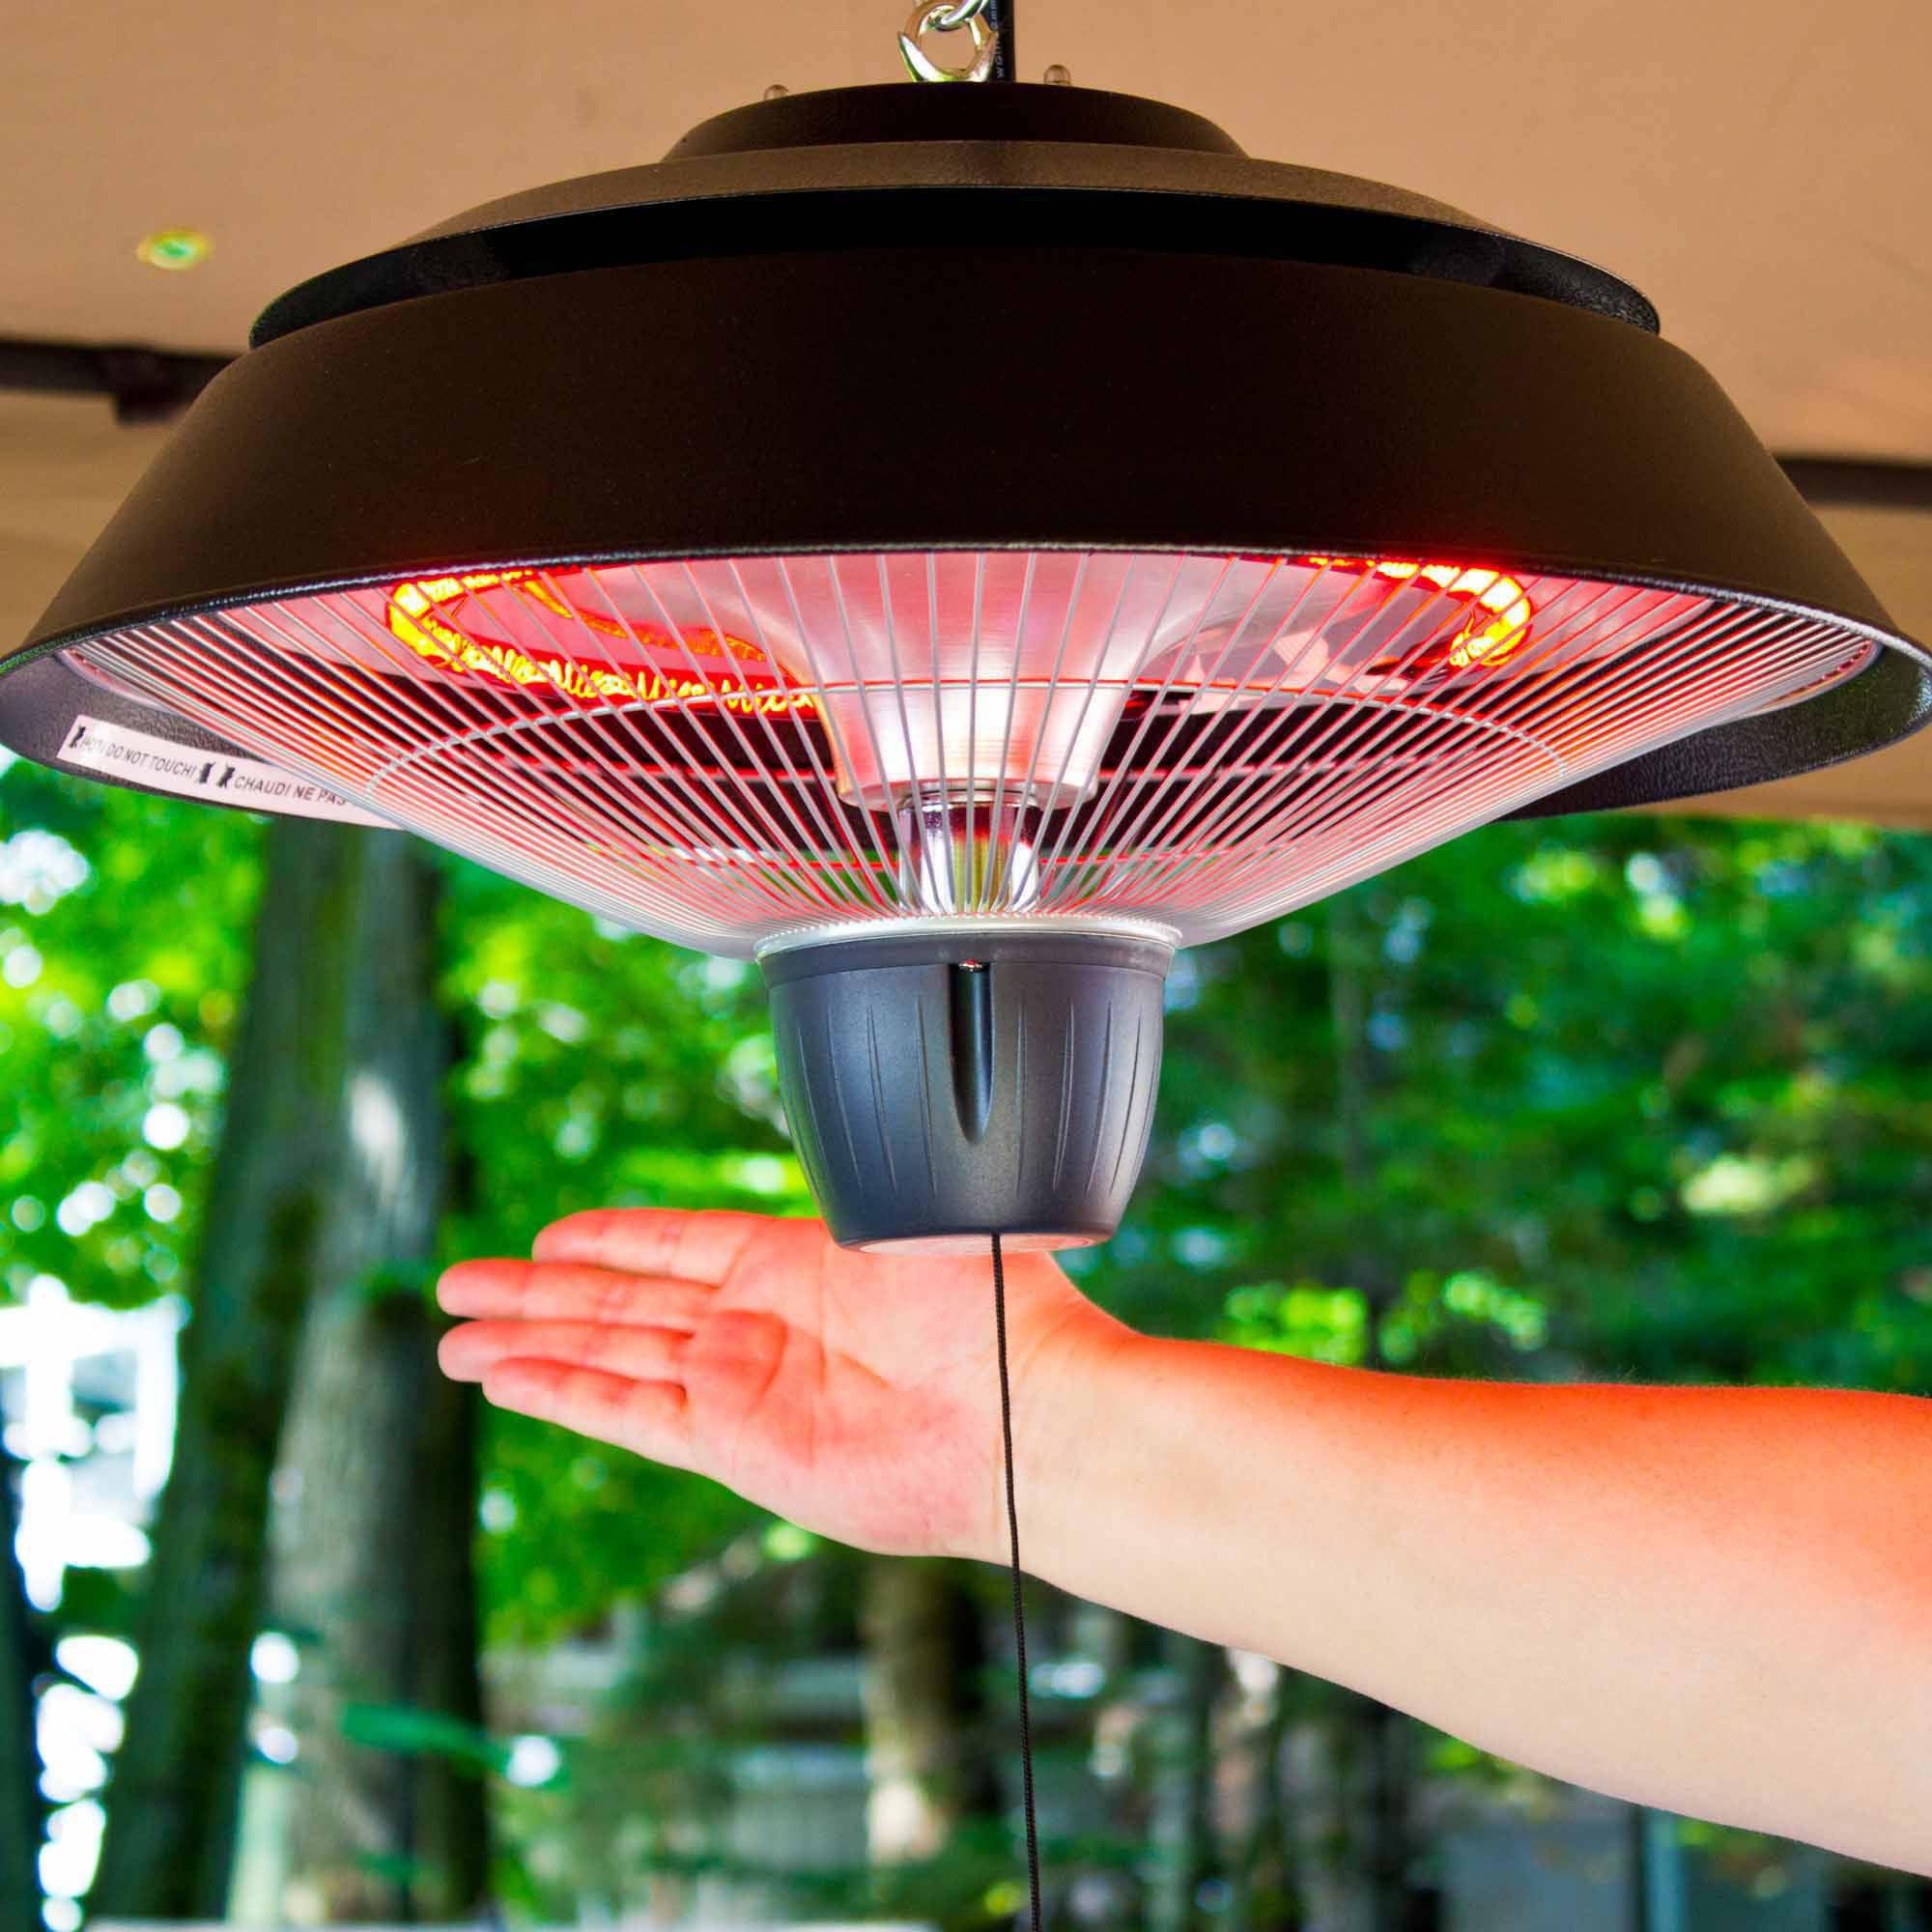 Energ 1500 Watt Hanging Electric Infrared Gazebo Heater Hammered